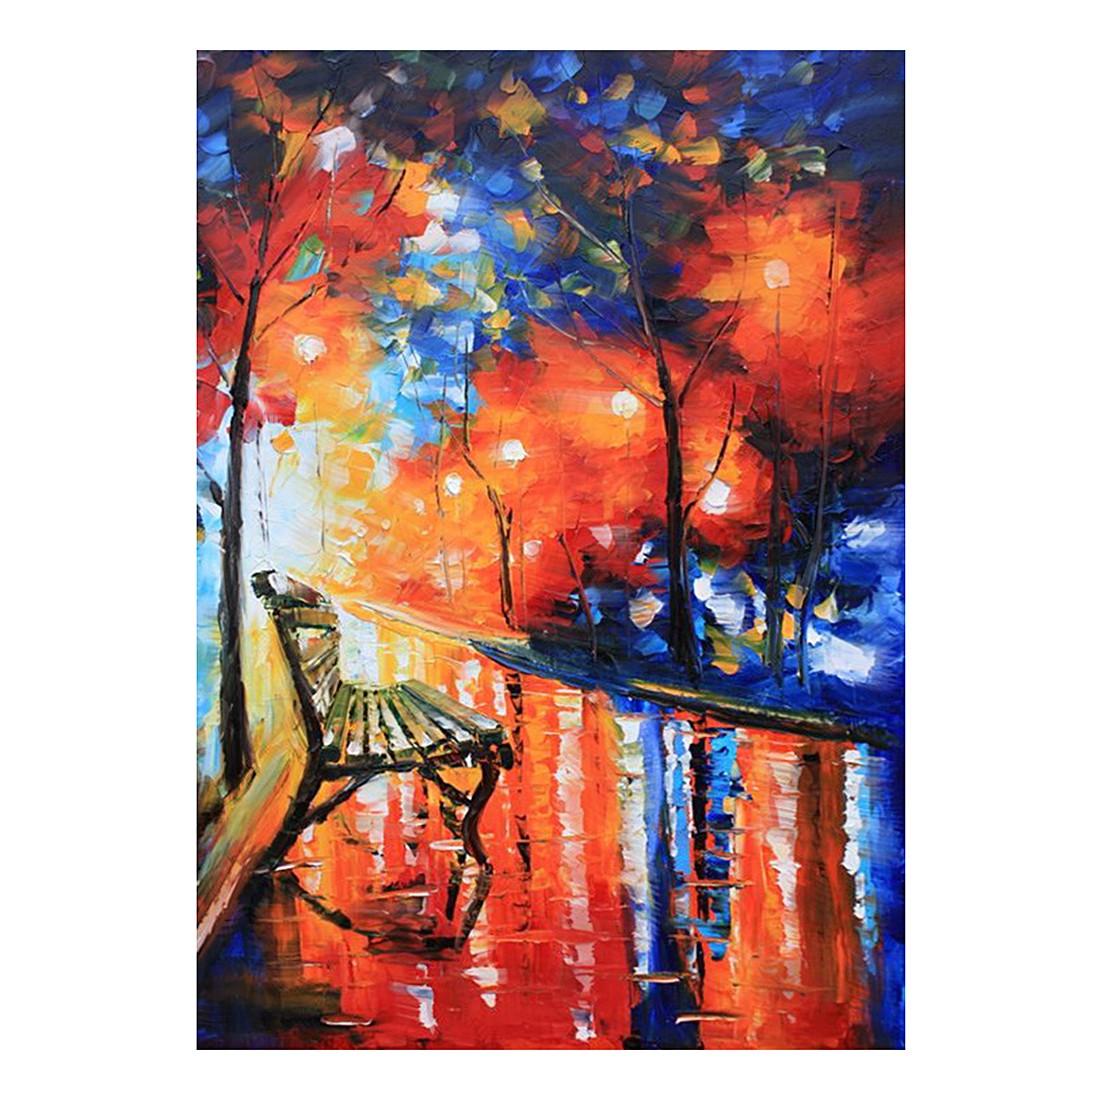 Ölgemälde Melodie Auberjonois – Größe 80 x 60 cm, your Painting kaufen